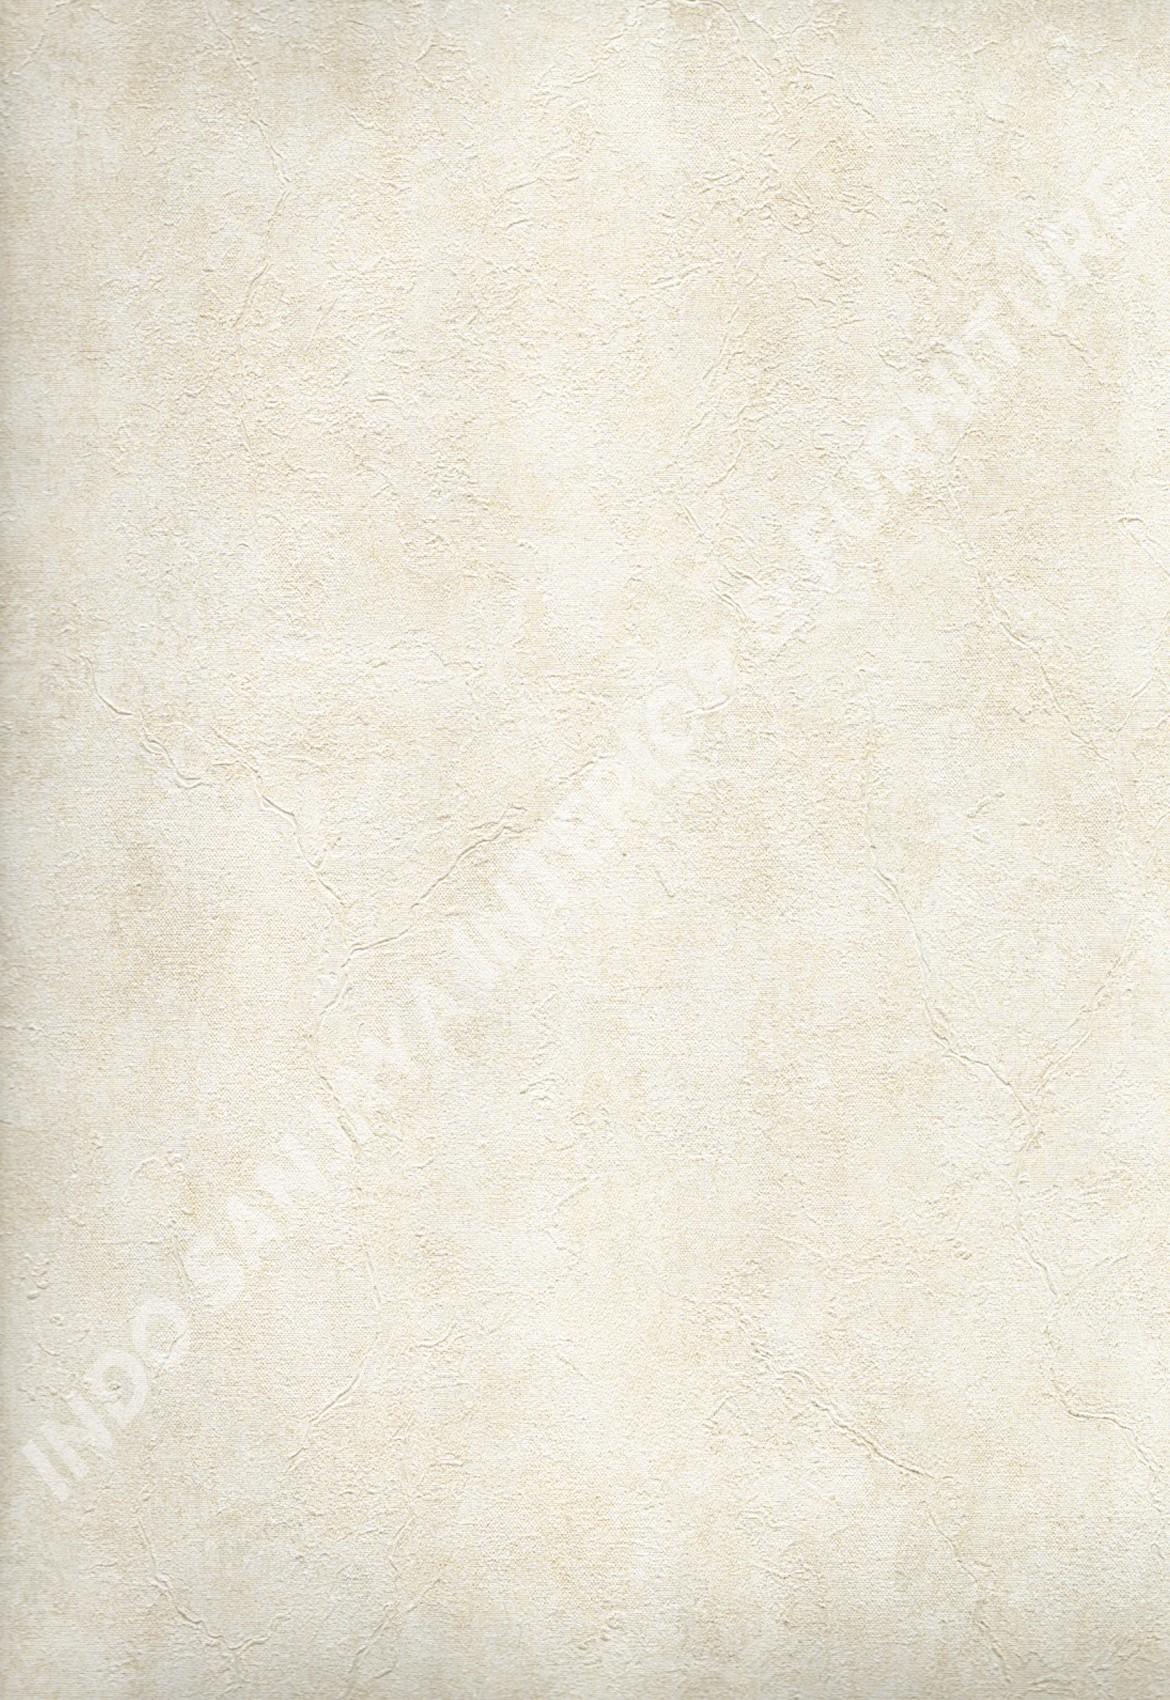 wallpaper   Wallpaper Minimalis Polos DL12001:DL12001 corak  warna